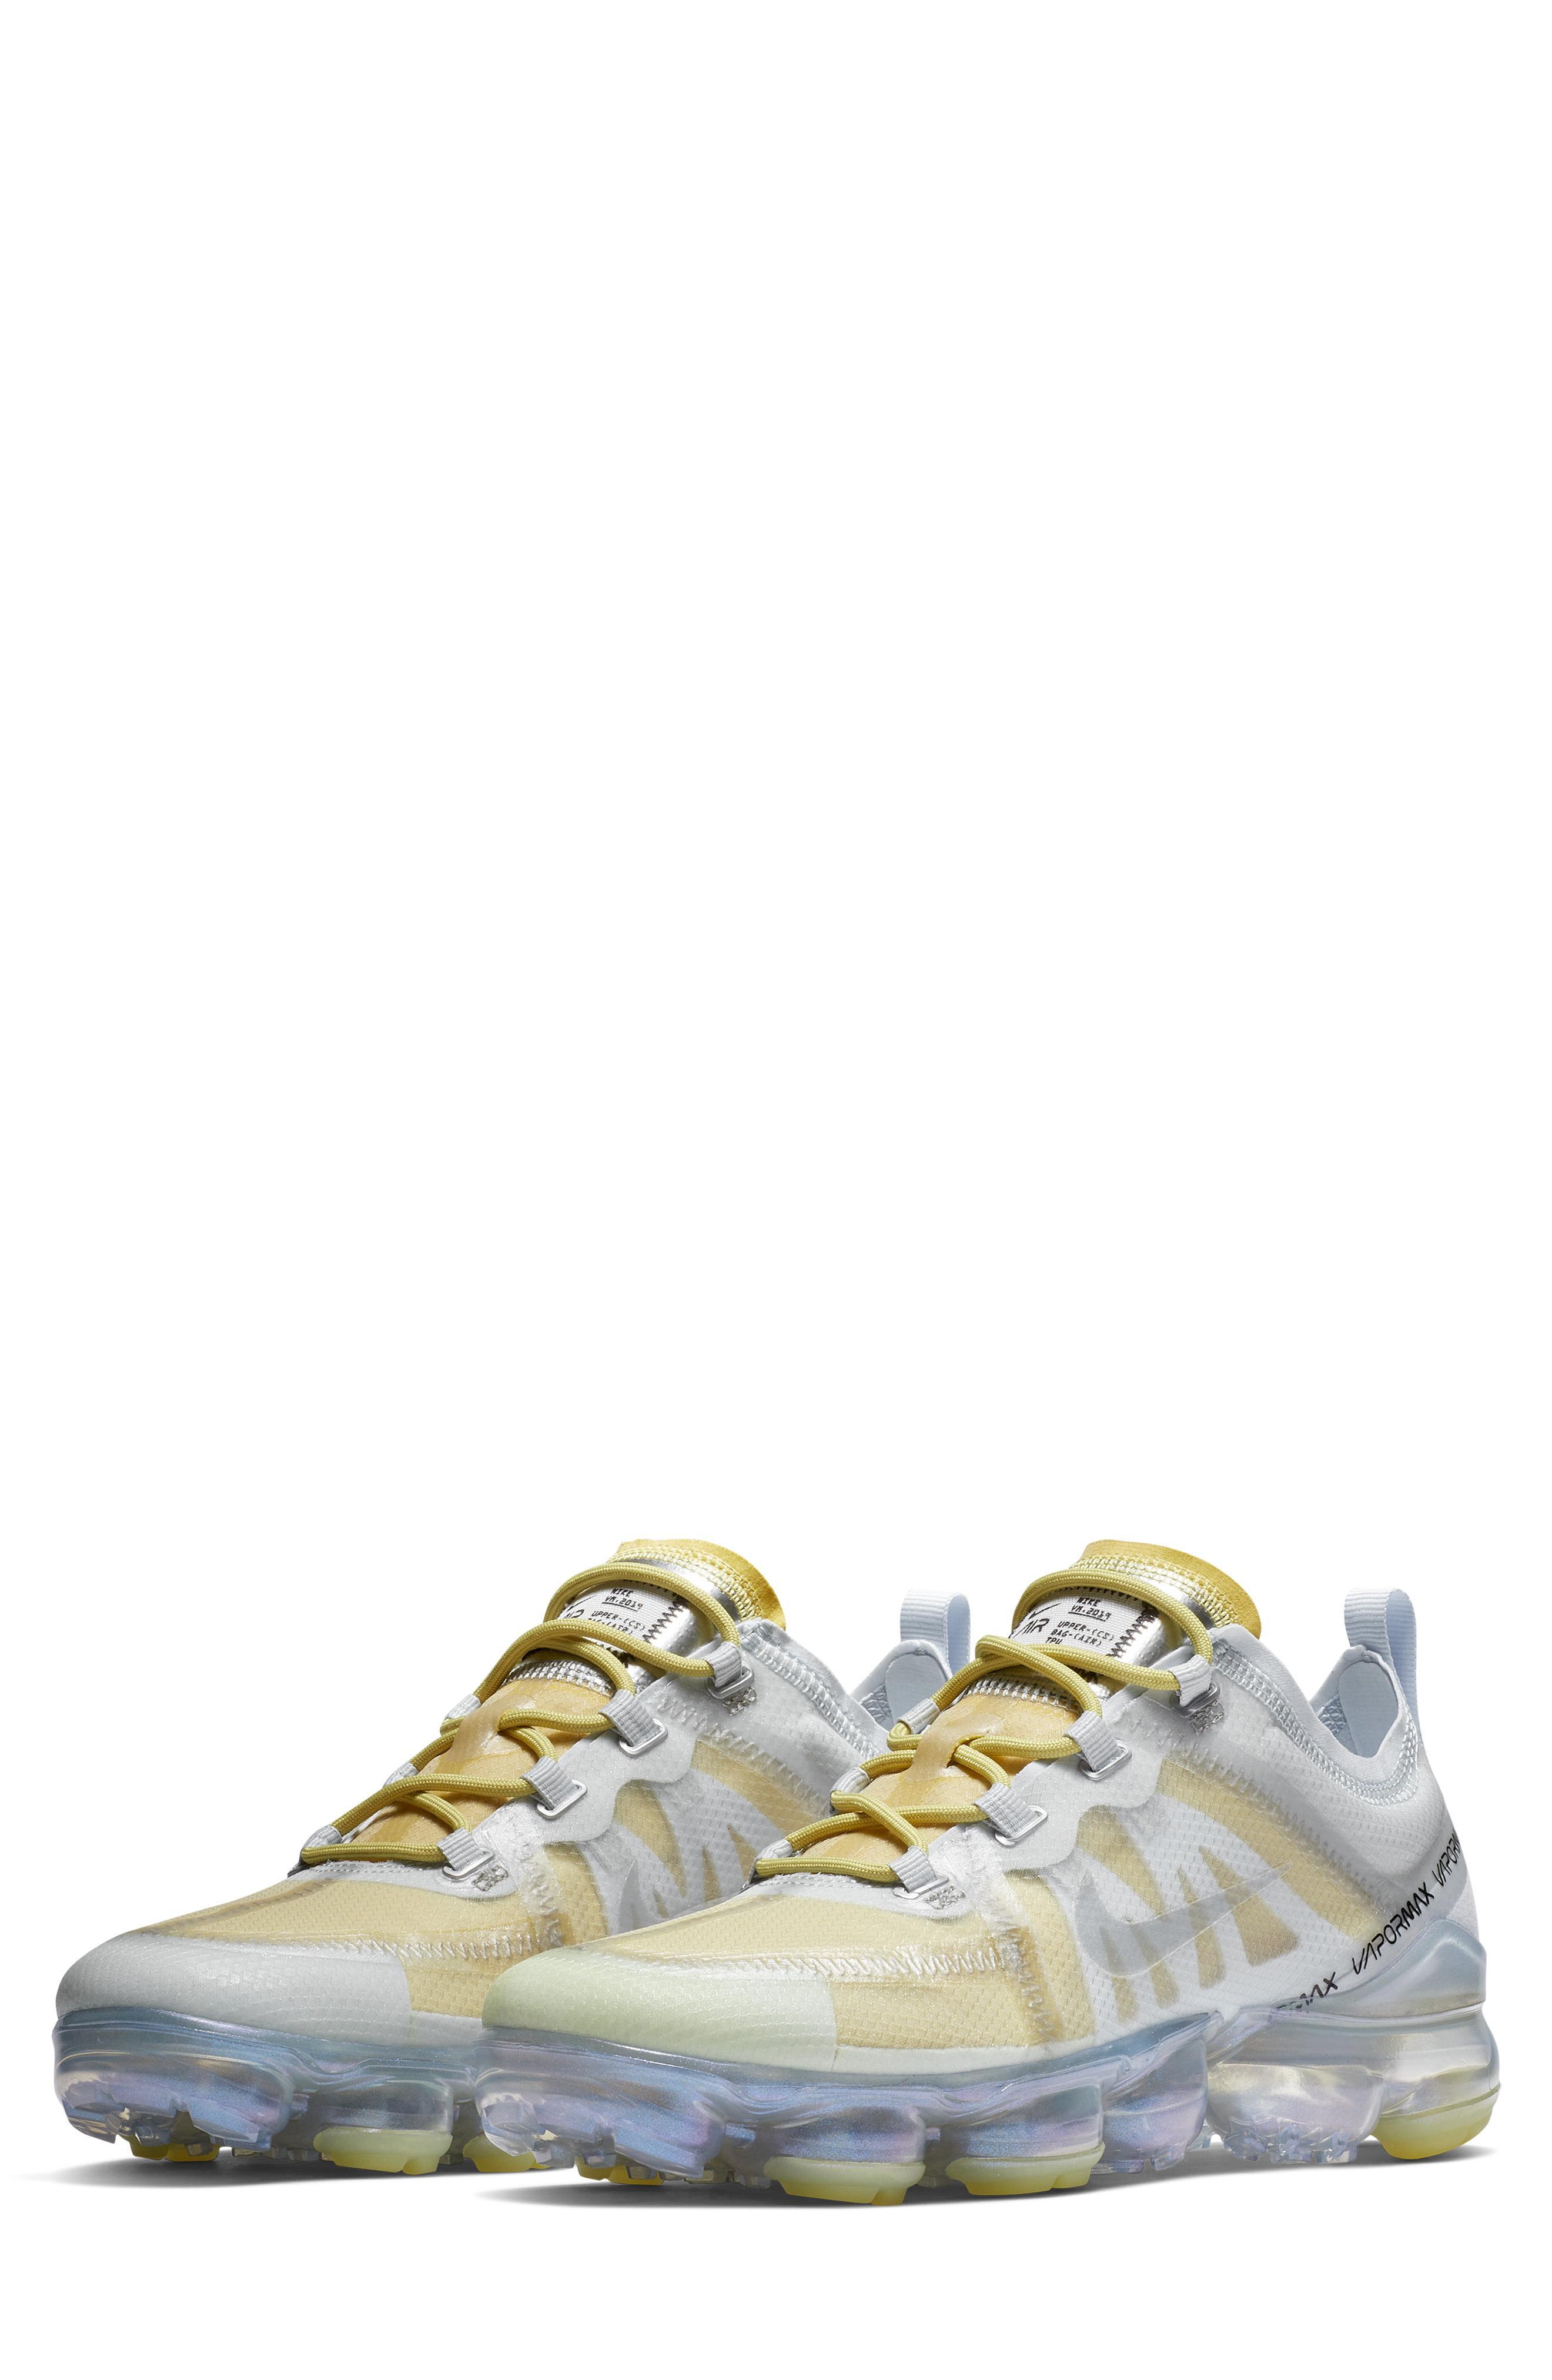 abb261aba91 Lyst - Nike Air Vapormax 2019 Premium Running Shoe